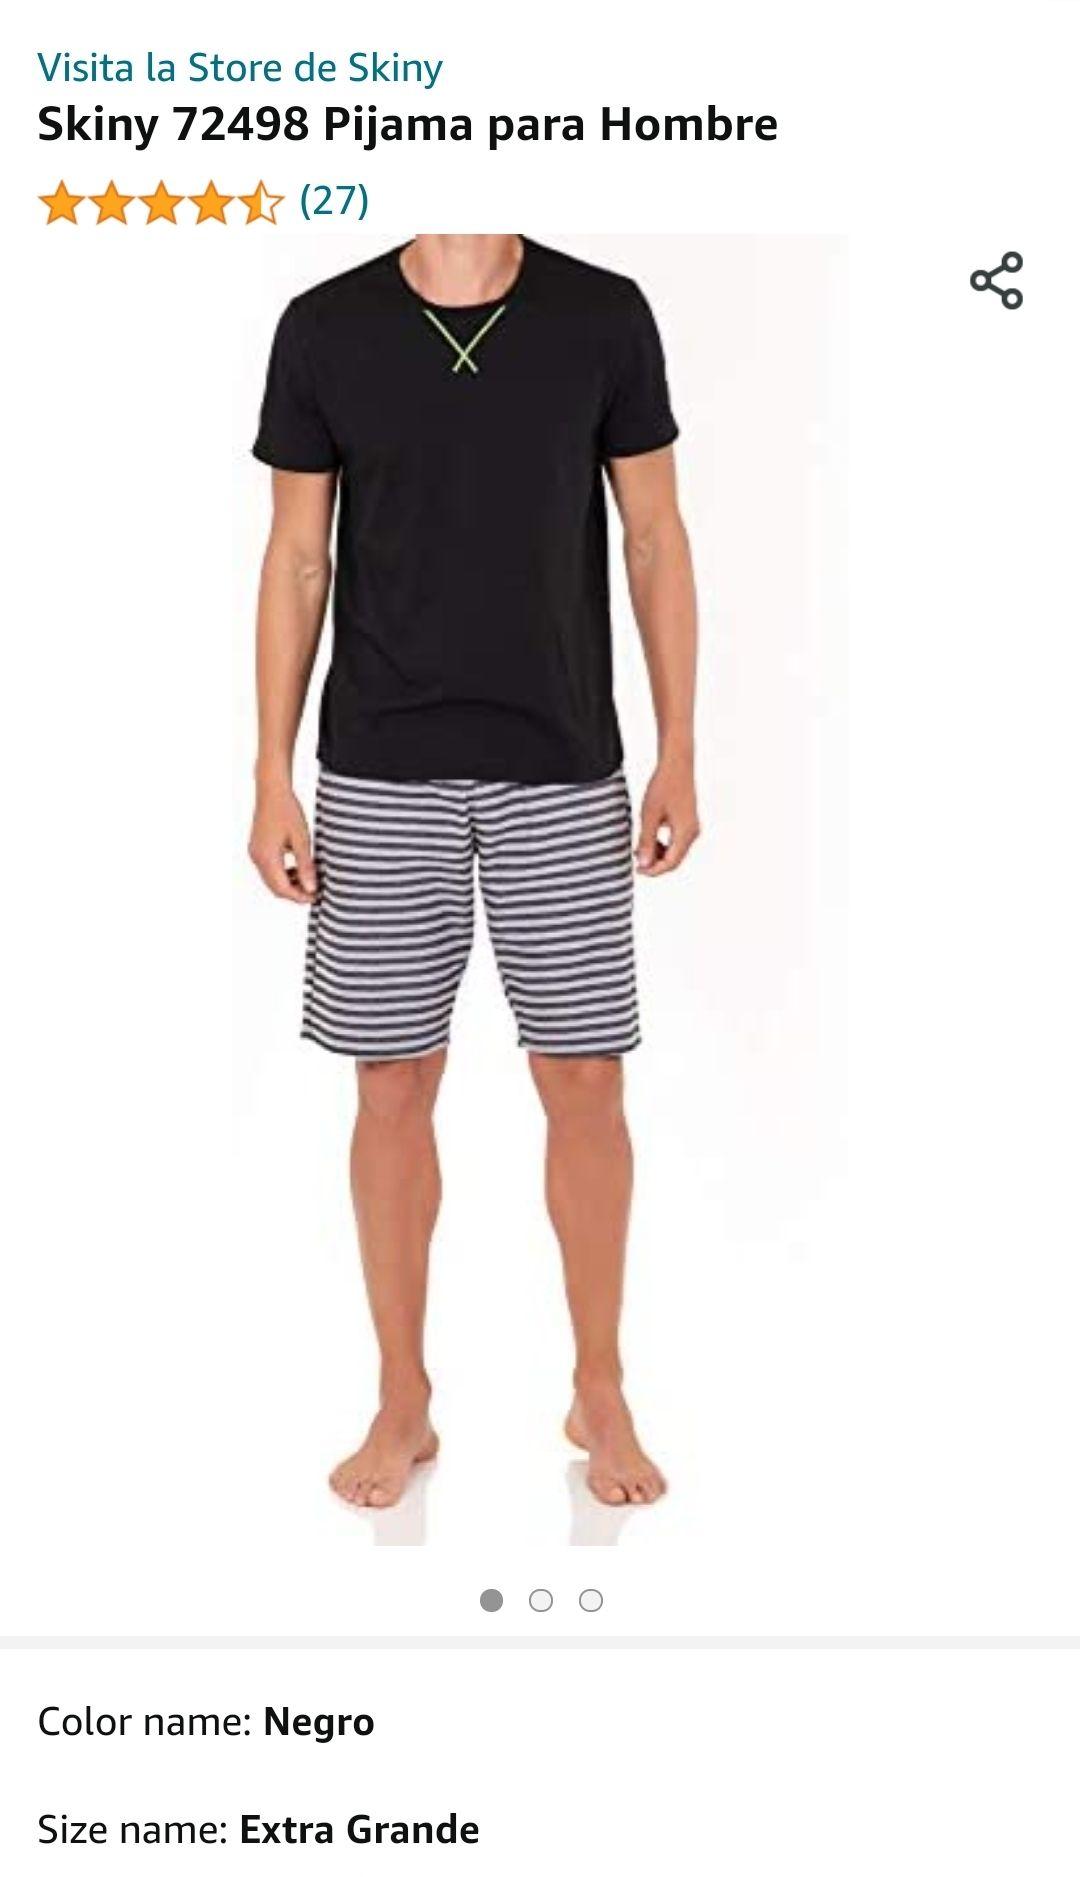 Amazon: Pijama para hombre